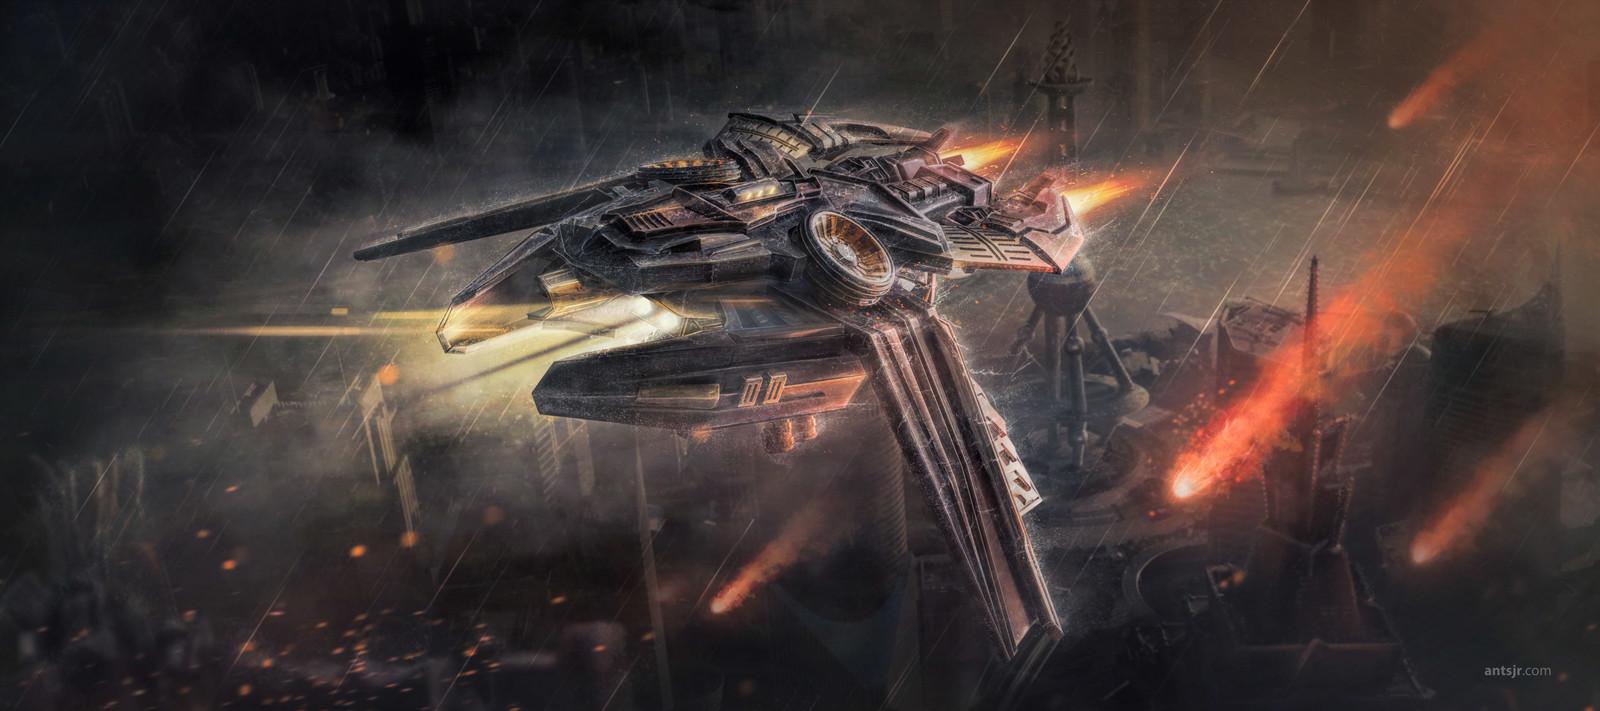 Starship - Final Artwork